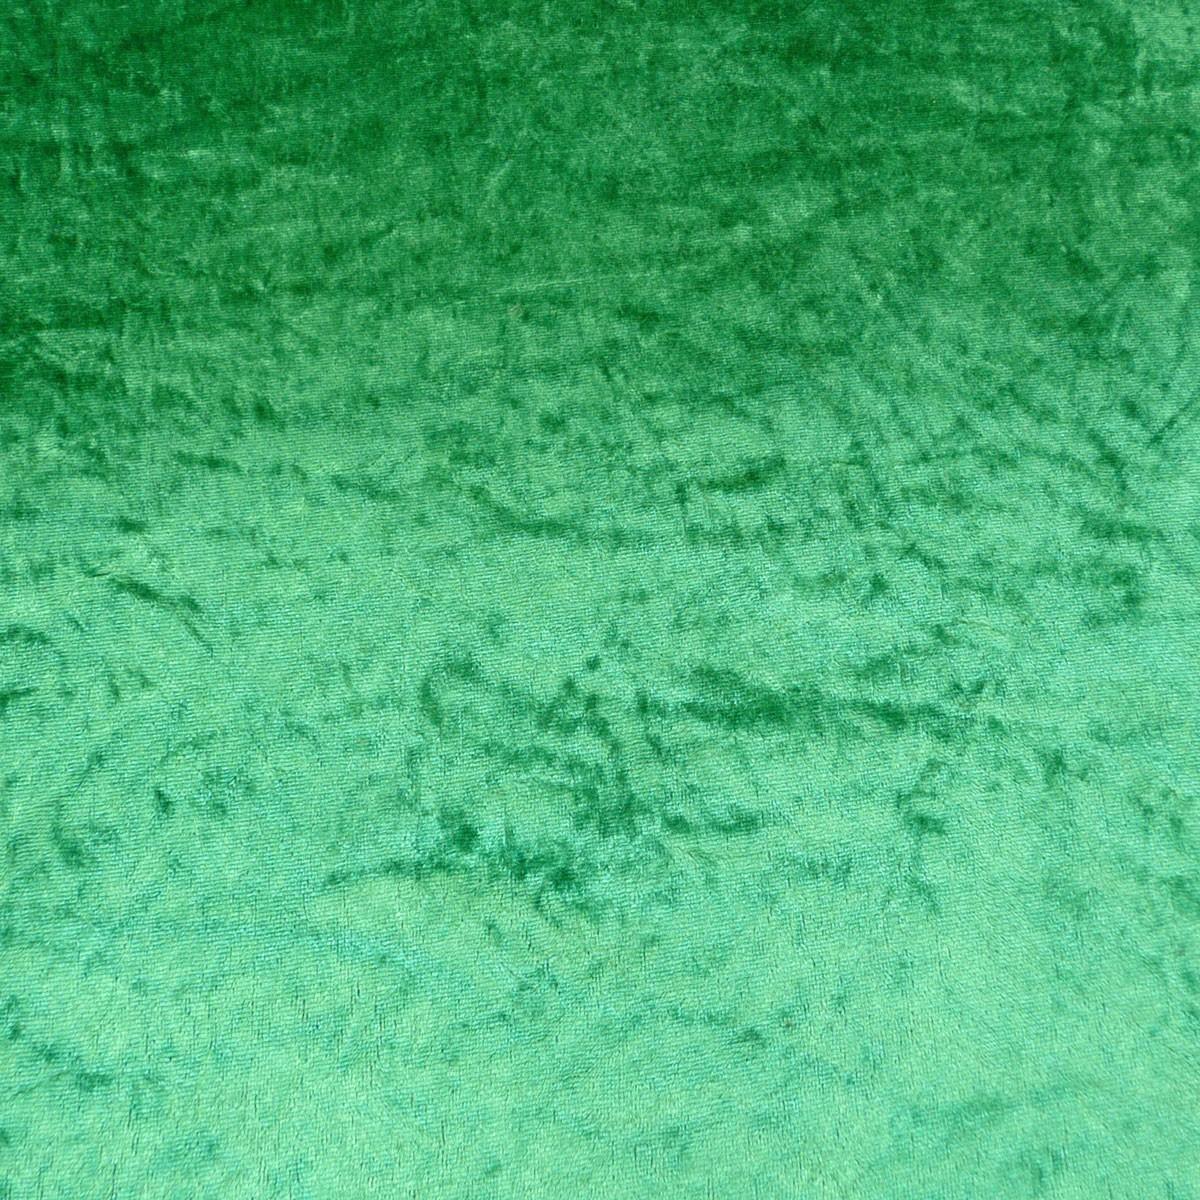 Samtstoff Kreativstoff Pannesamt einfarbig grün 1,5m